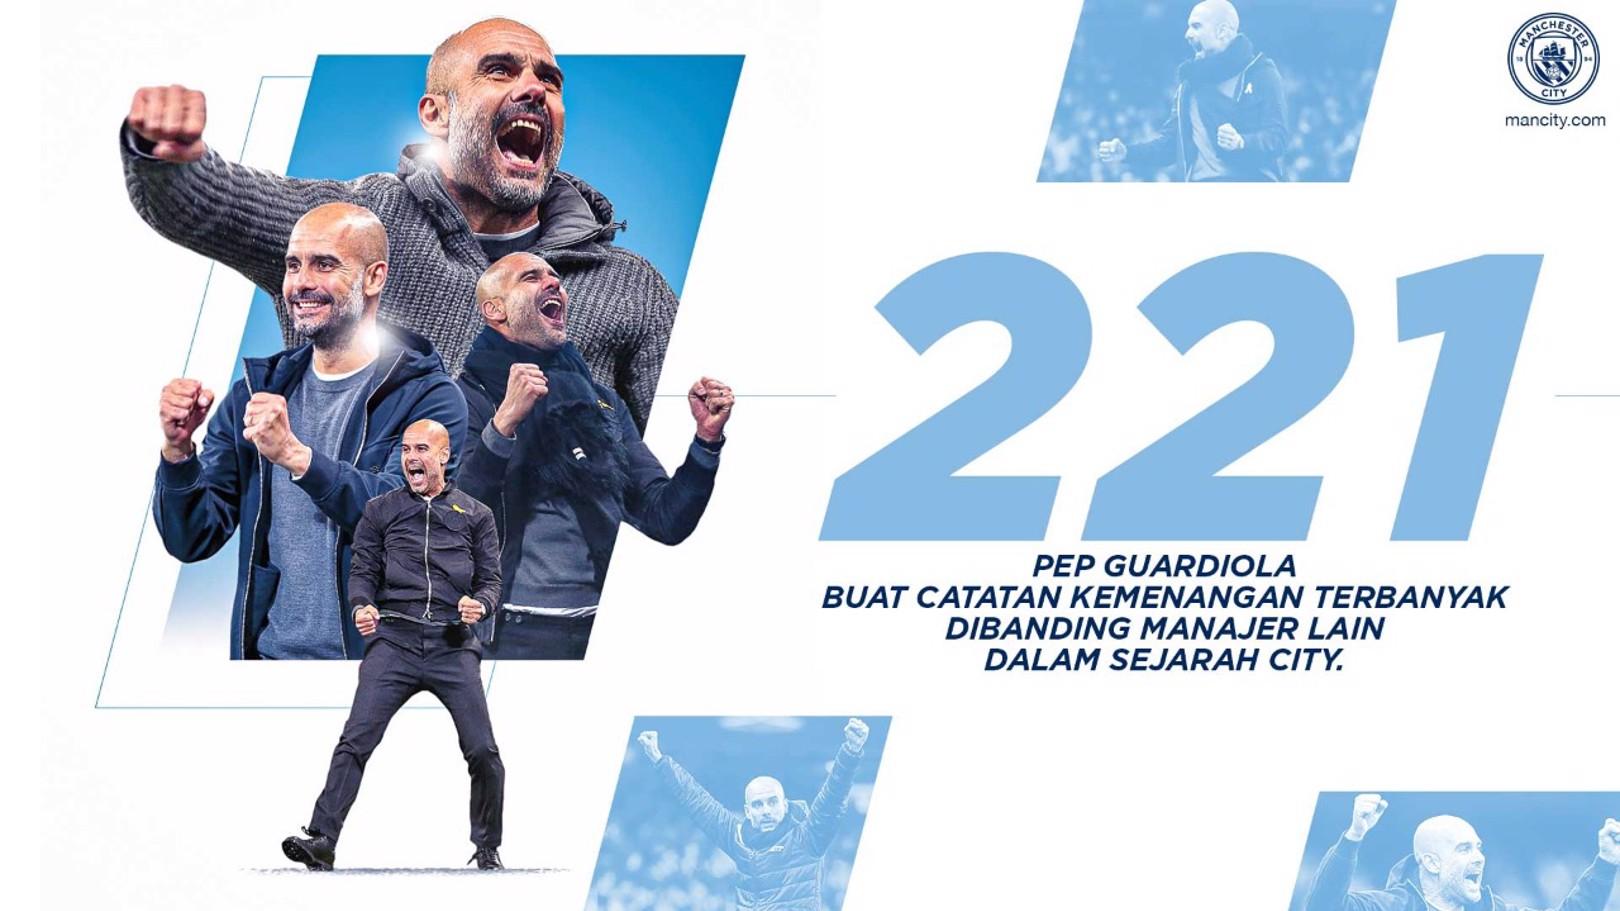 Guardiola Buat Rekor Klub Yang Baru